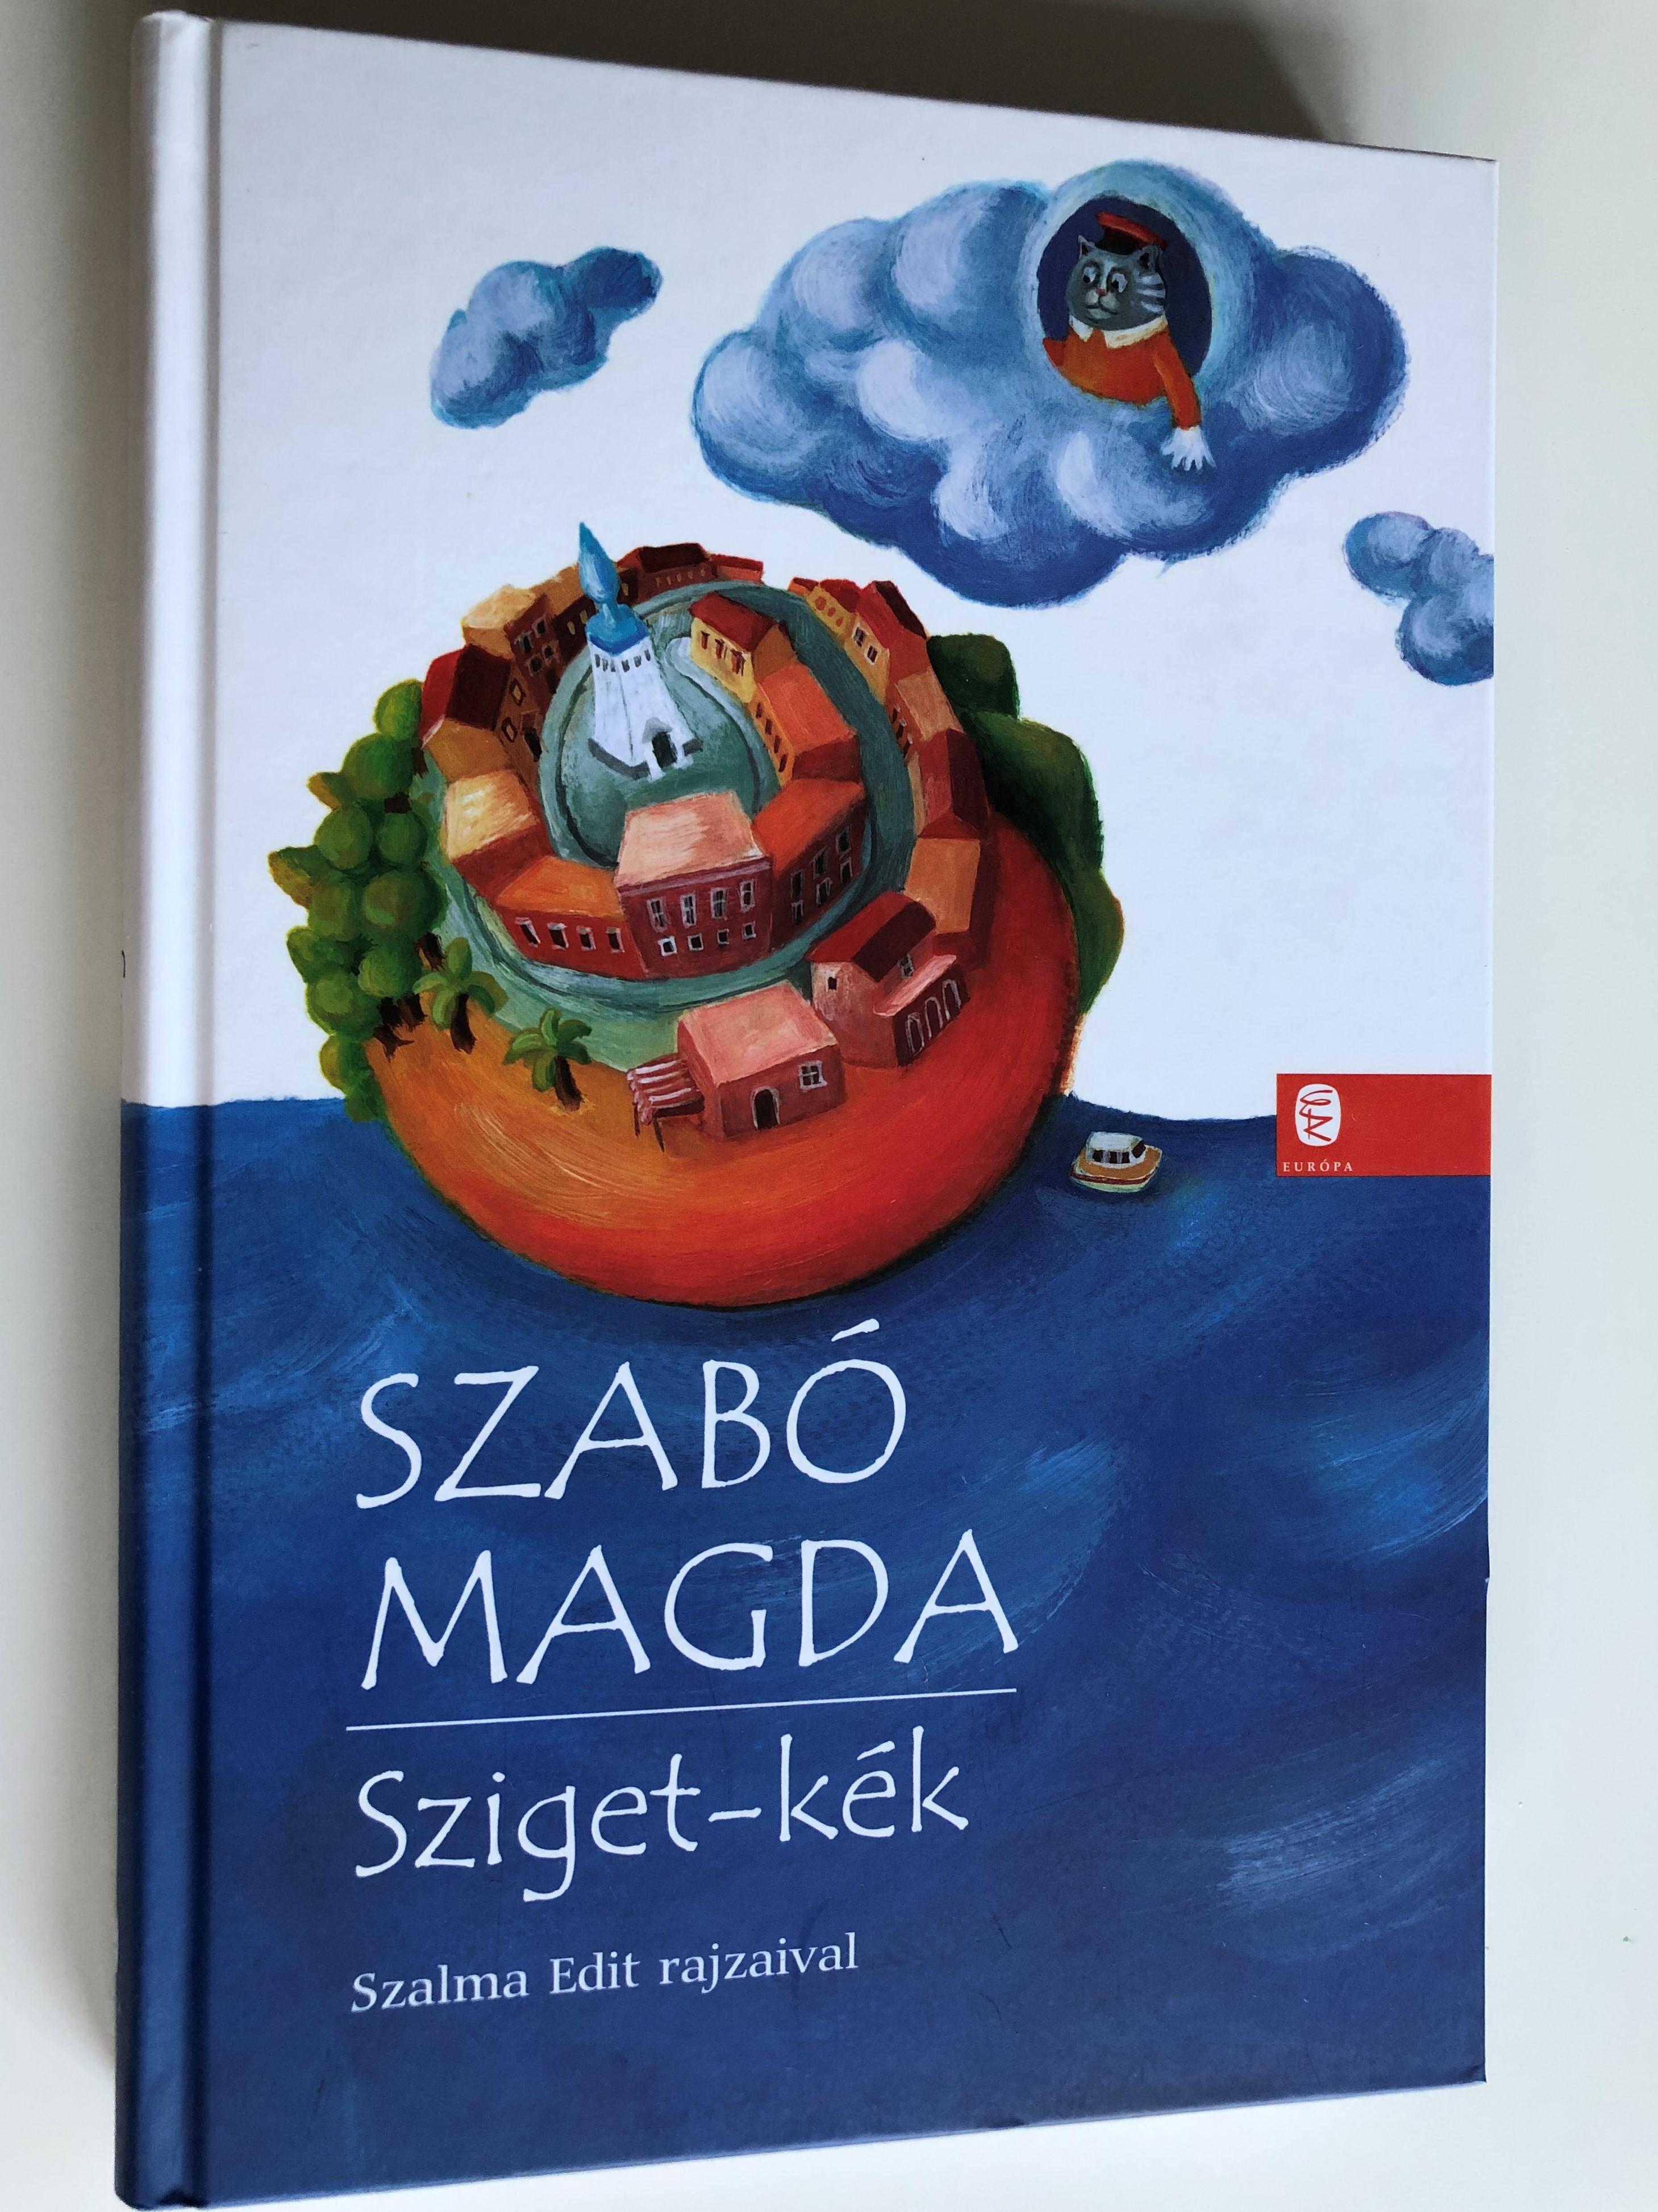 sziget-k-k-by-szab-magda-island-blue-hungarian-novel-for-children-szalma-edit-rajzaival-eur-pa-k-nyvkiad-2013-1-.jpg